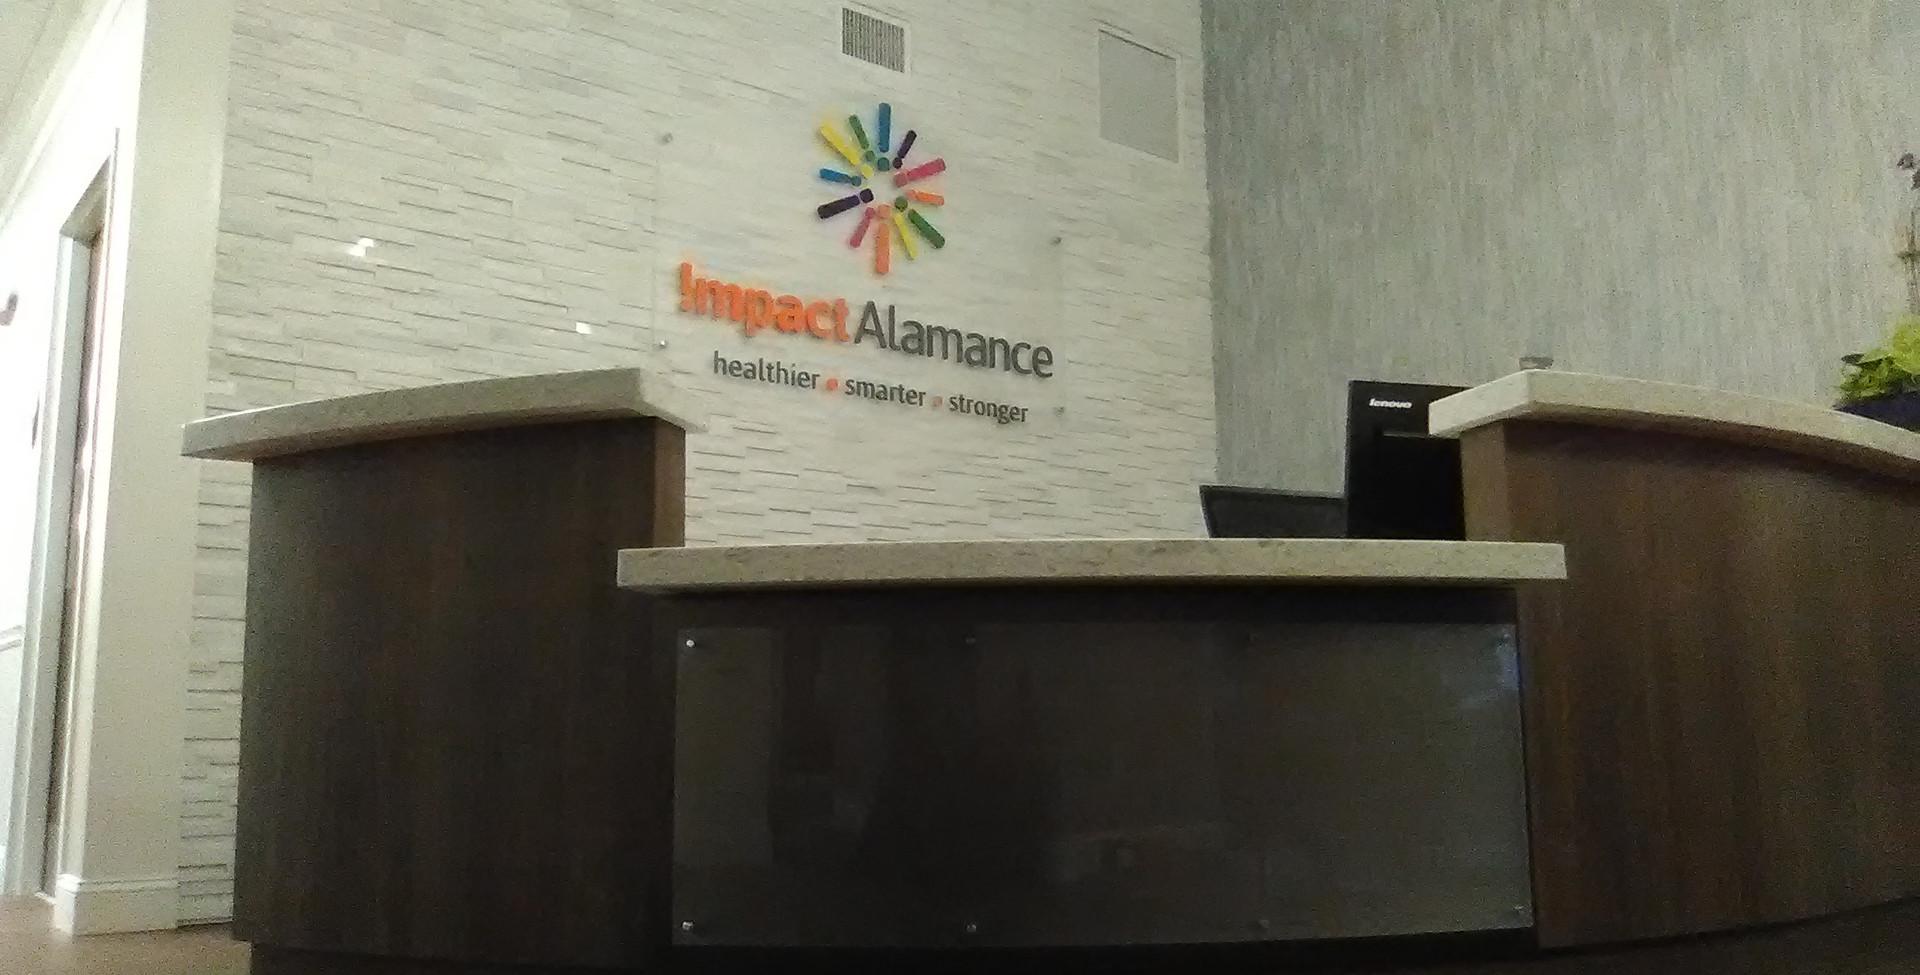 Impact Alamance